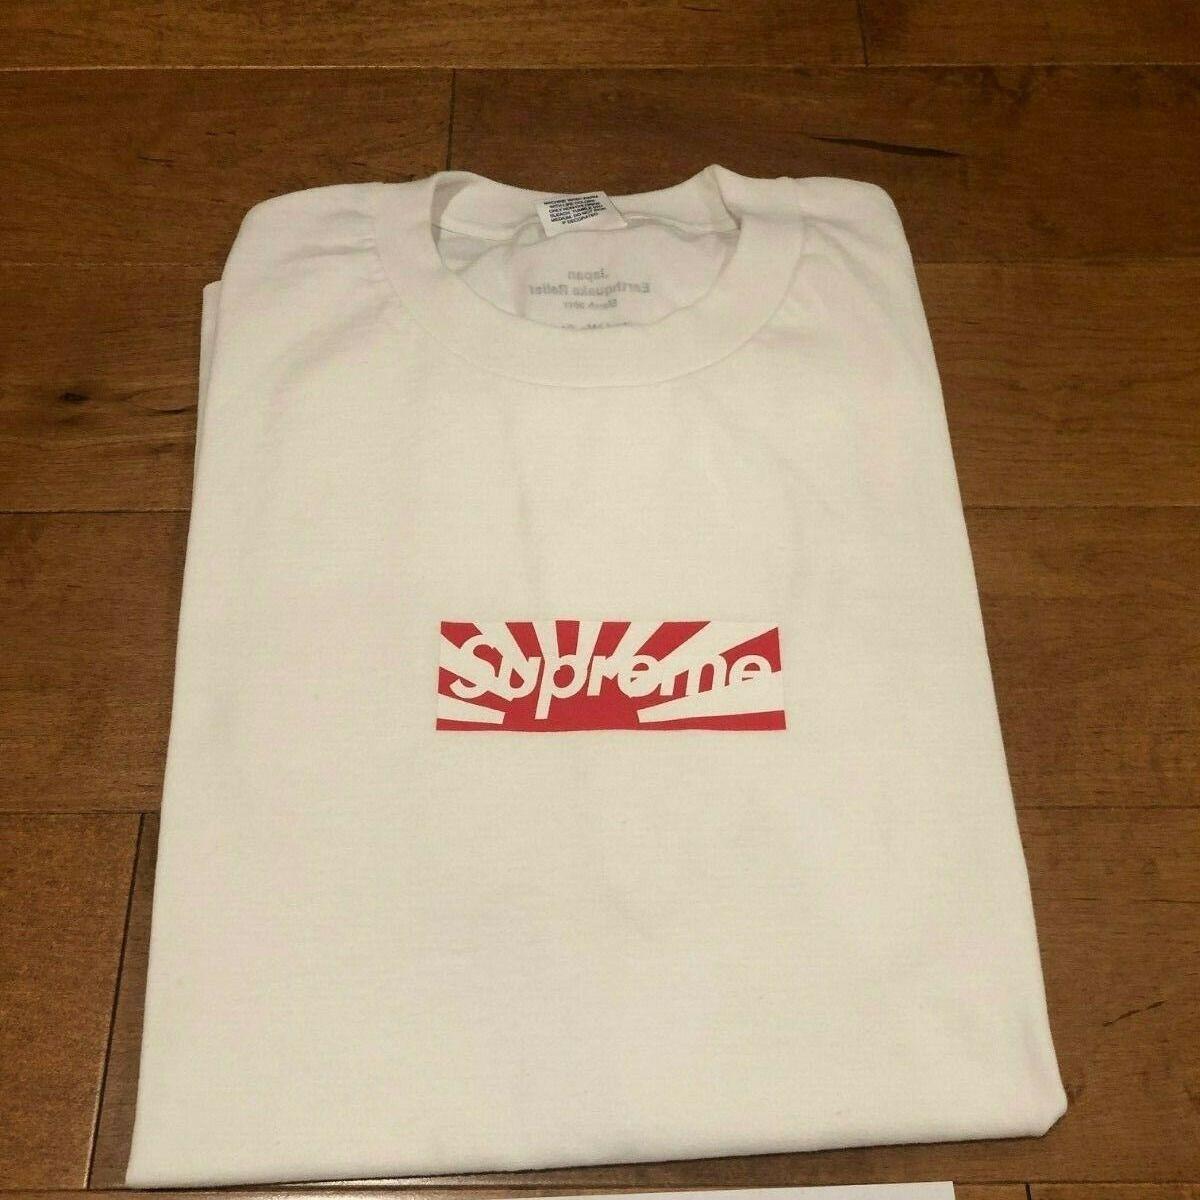 Supreme Japan Earthquake Relief Ss11 Box Logo Tee T Shirt Size Large L Bape Box Logo Tee Bape Shirt Size